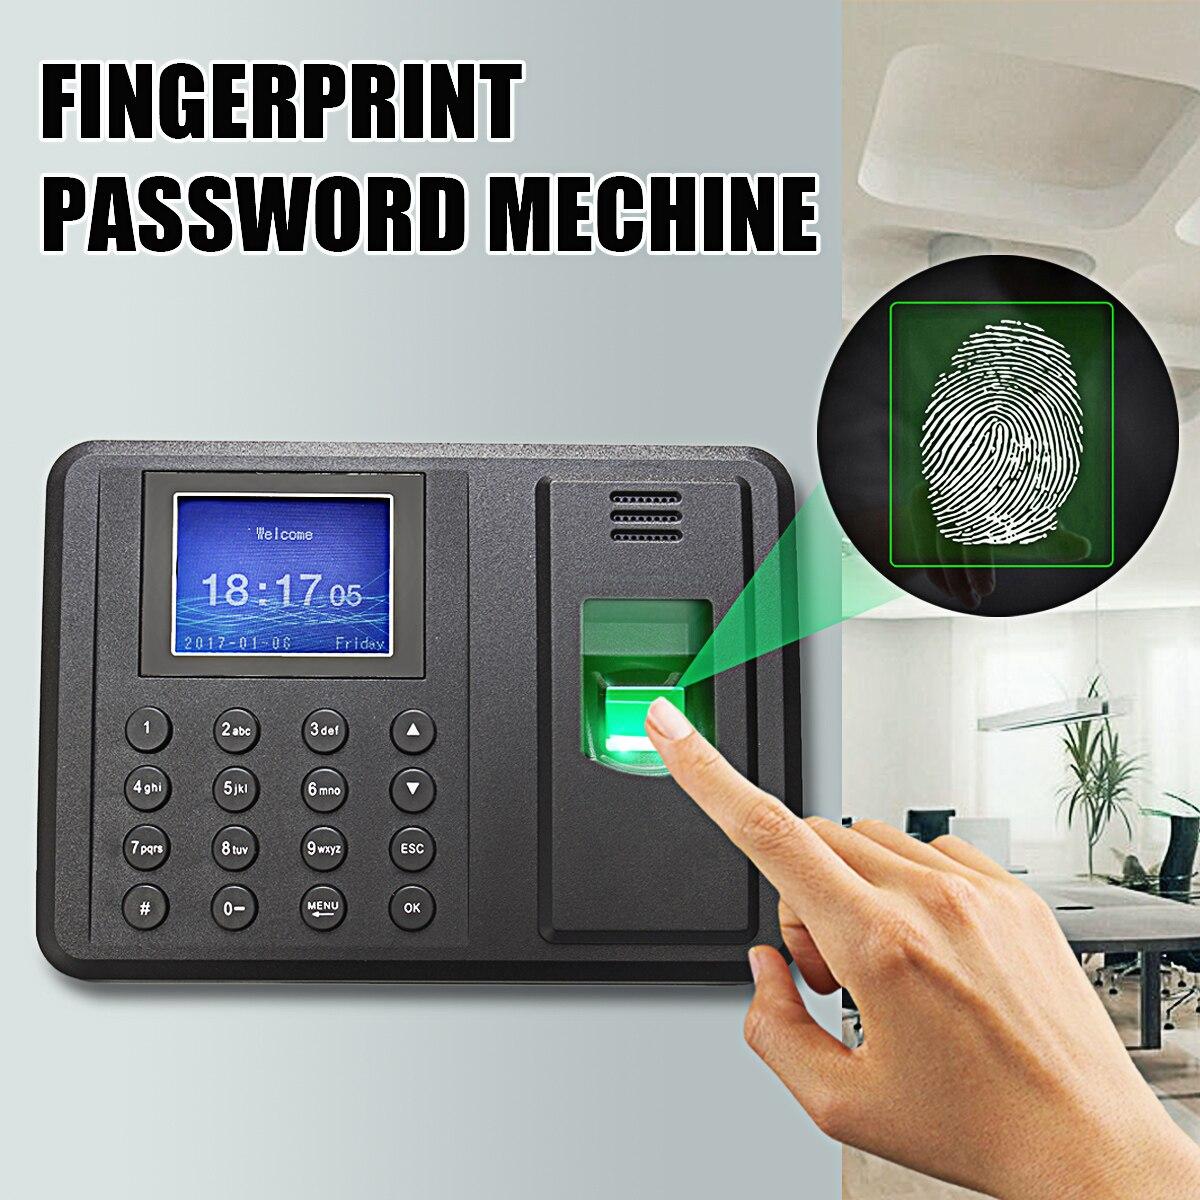 usb-password-biometric-fingerprint-time-office-attendance-clock-recorder-employee-electronic-access-control-machine